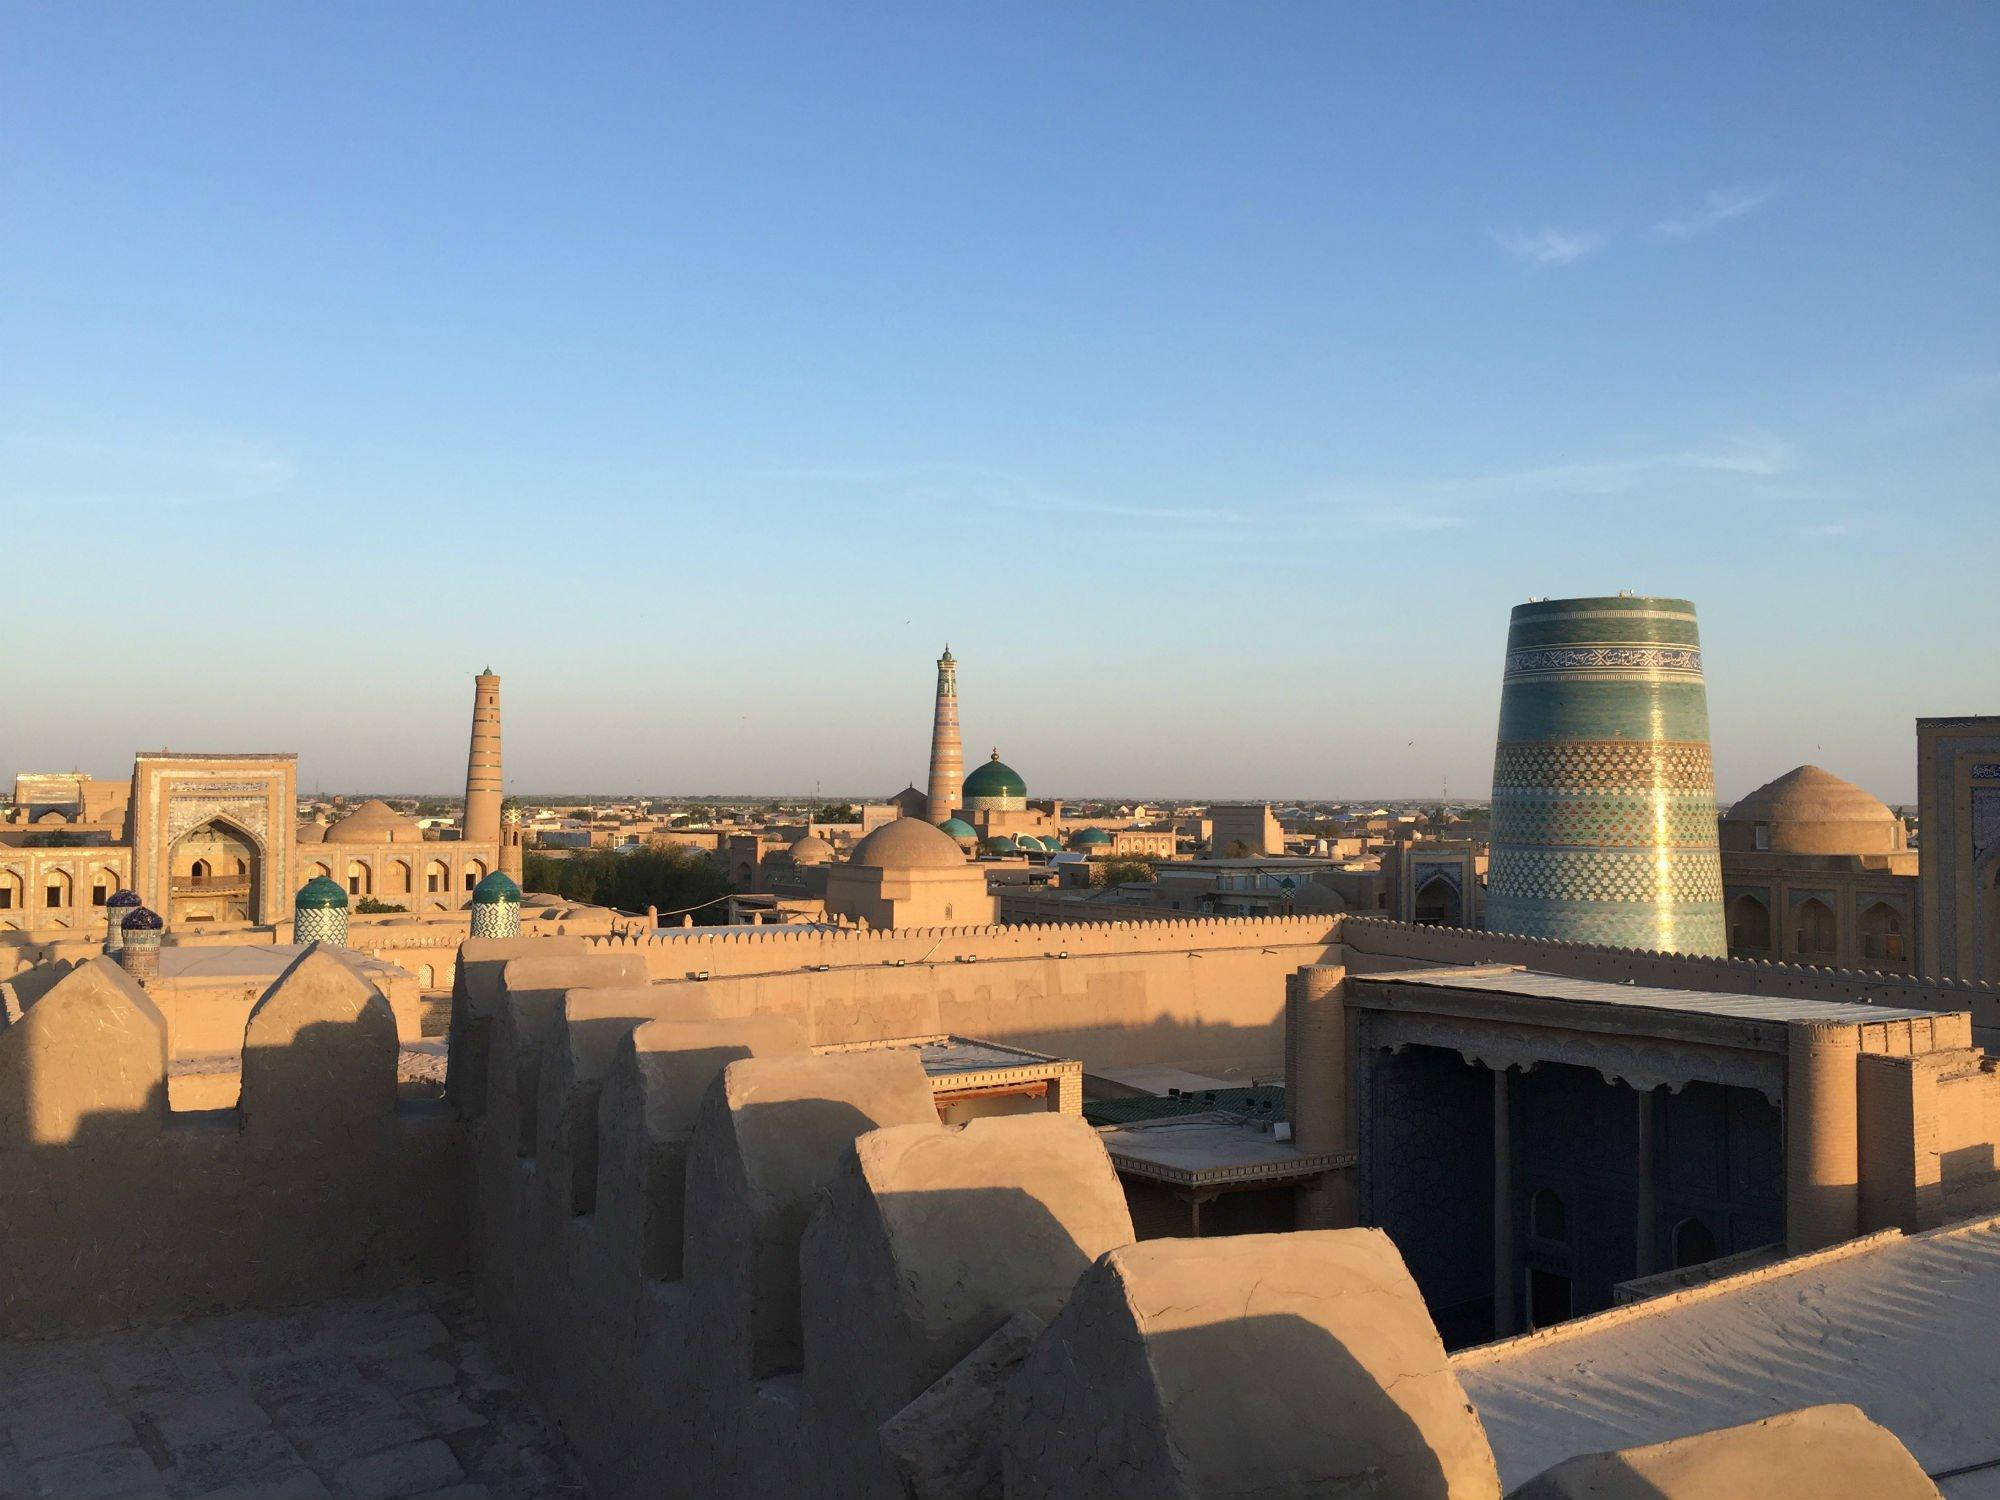 UZBEKISTAN Khiva 1 VIAGGIO IN UZBEKISTAN